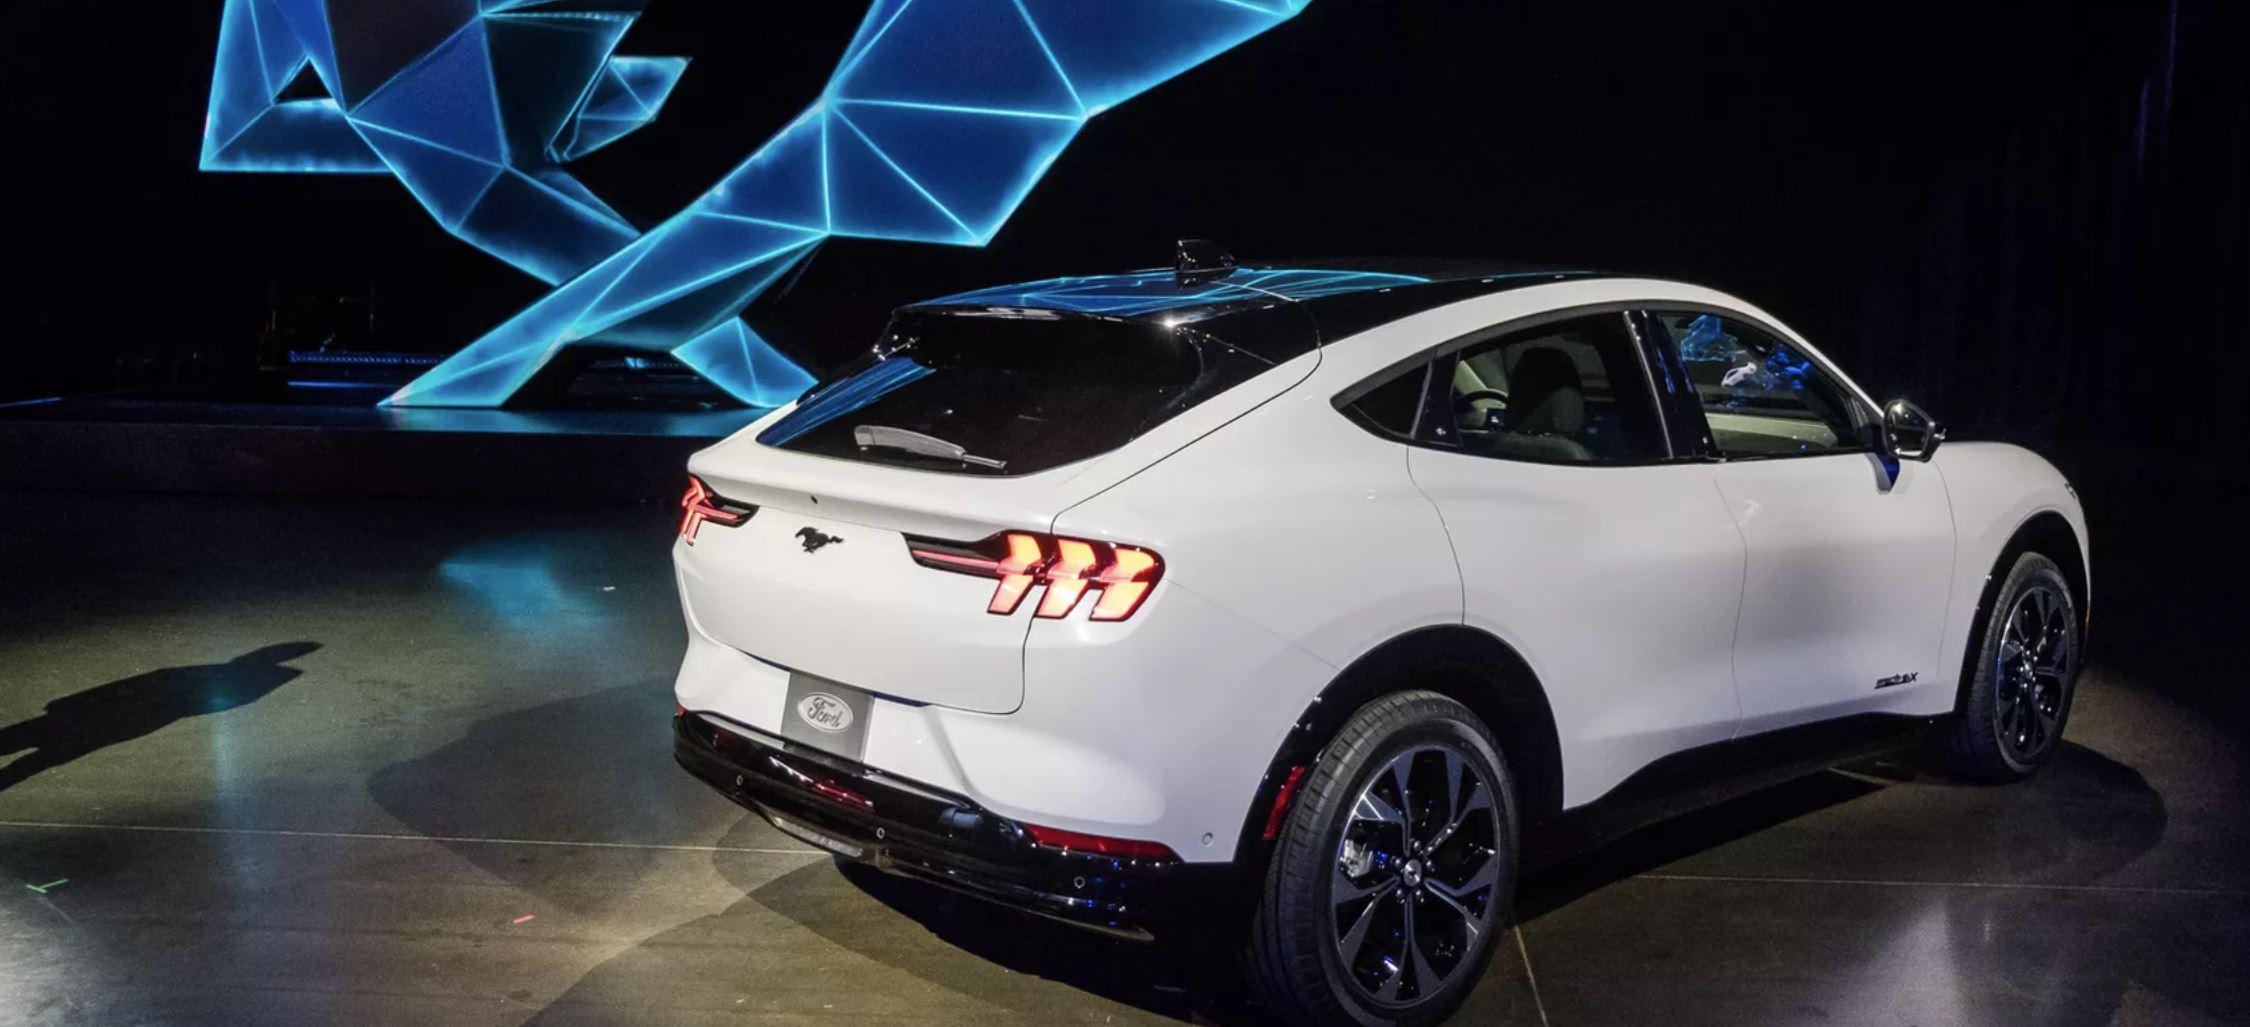 Mustang Mach-E, predstavitev